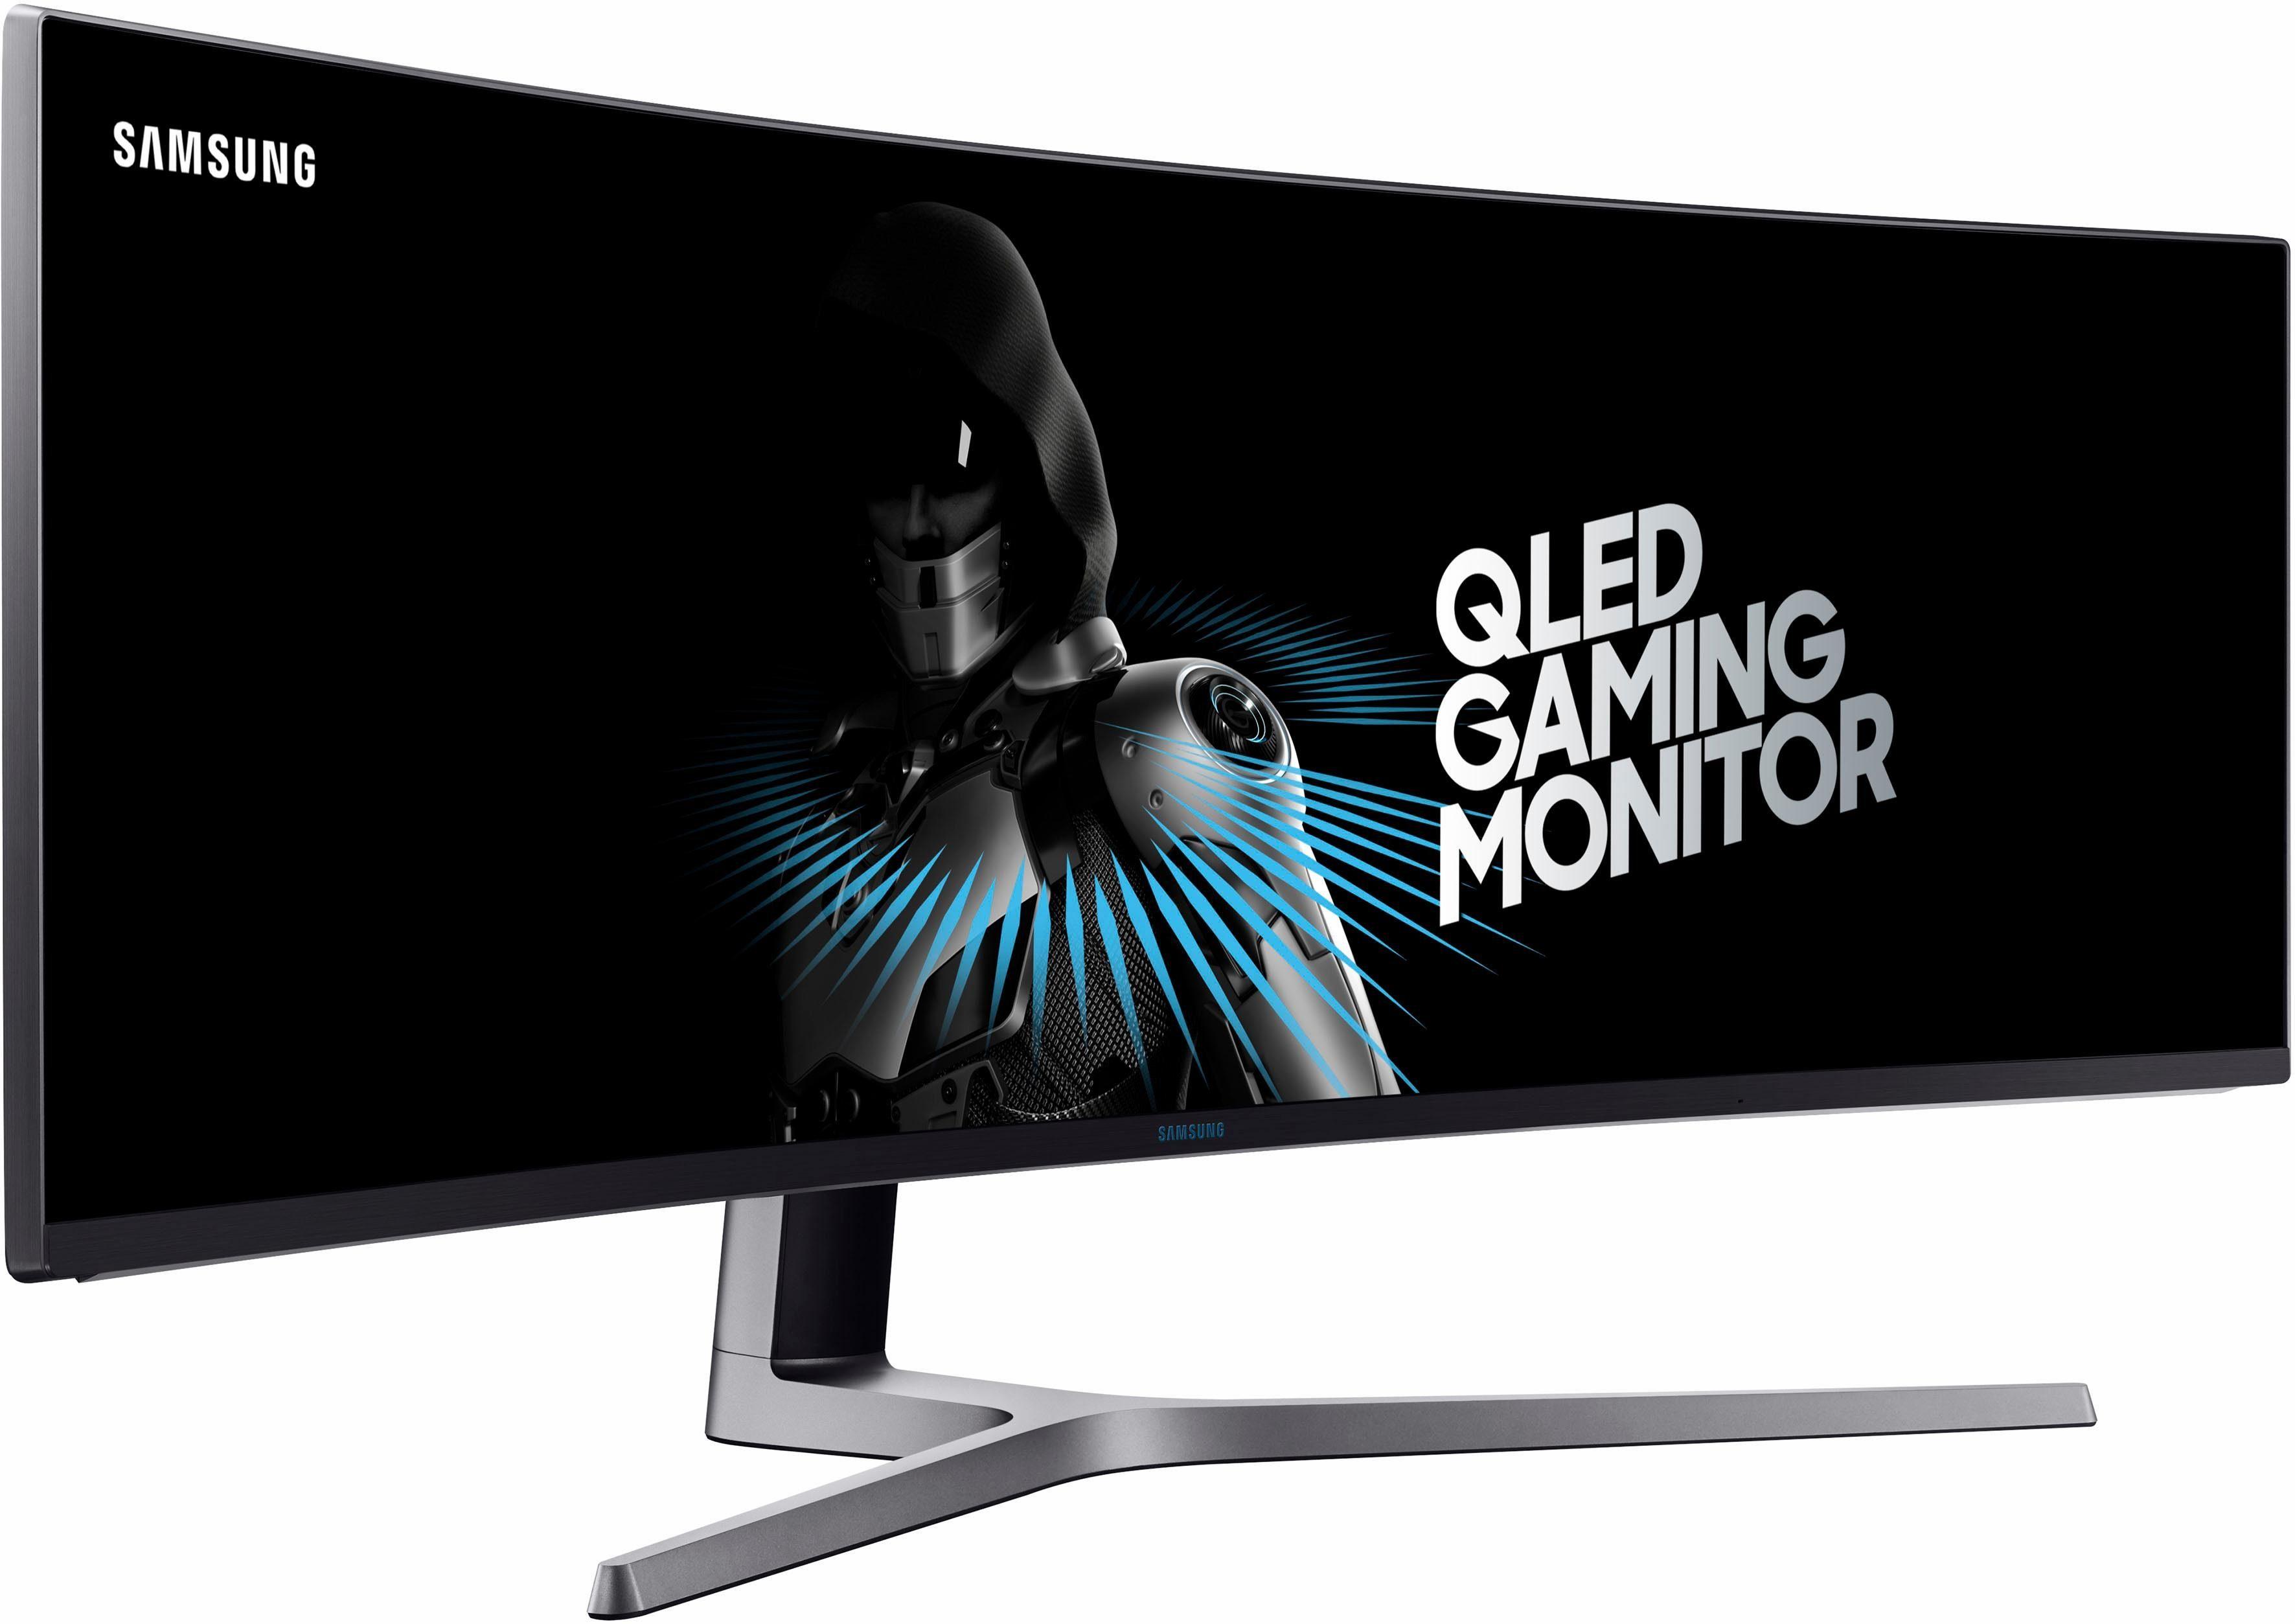 Samsung LC49HG90DMUXEN LED-Monitor (3840 x 1080 Pixel, Full HD, 1 ms Reaktionszeit, Mega DCR)